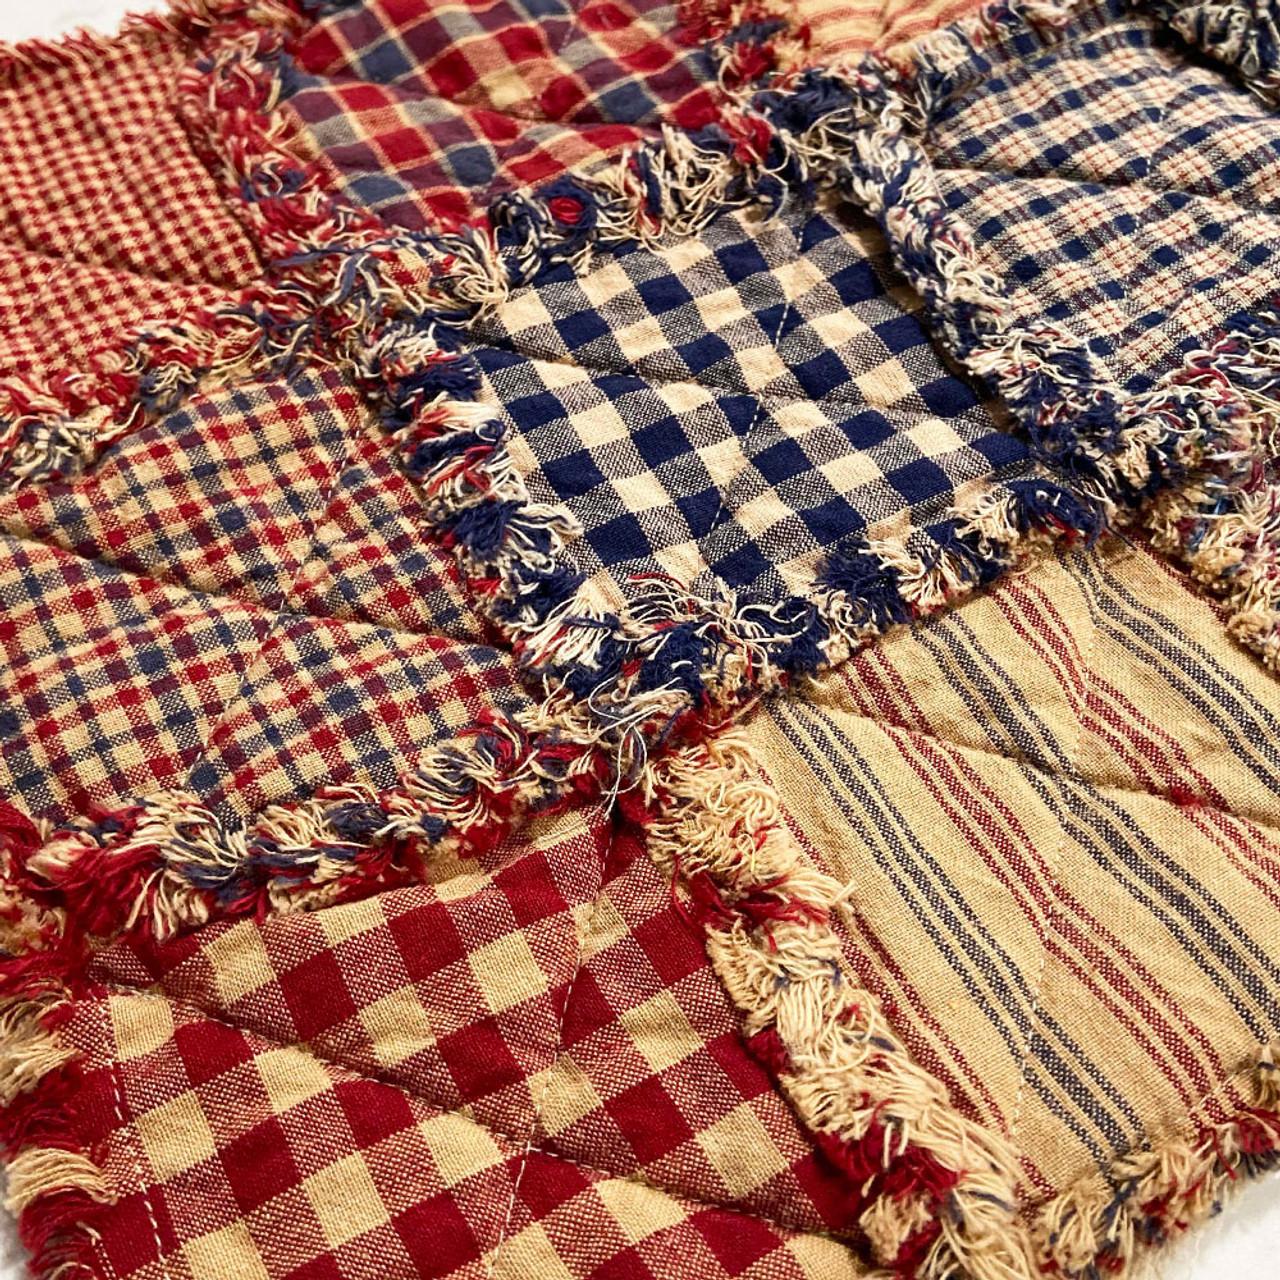 40+ American Heritage Plaid Homespun 5 inch Quilt Squares